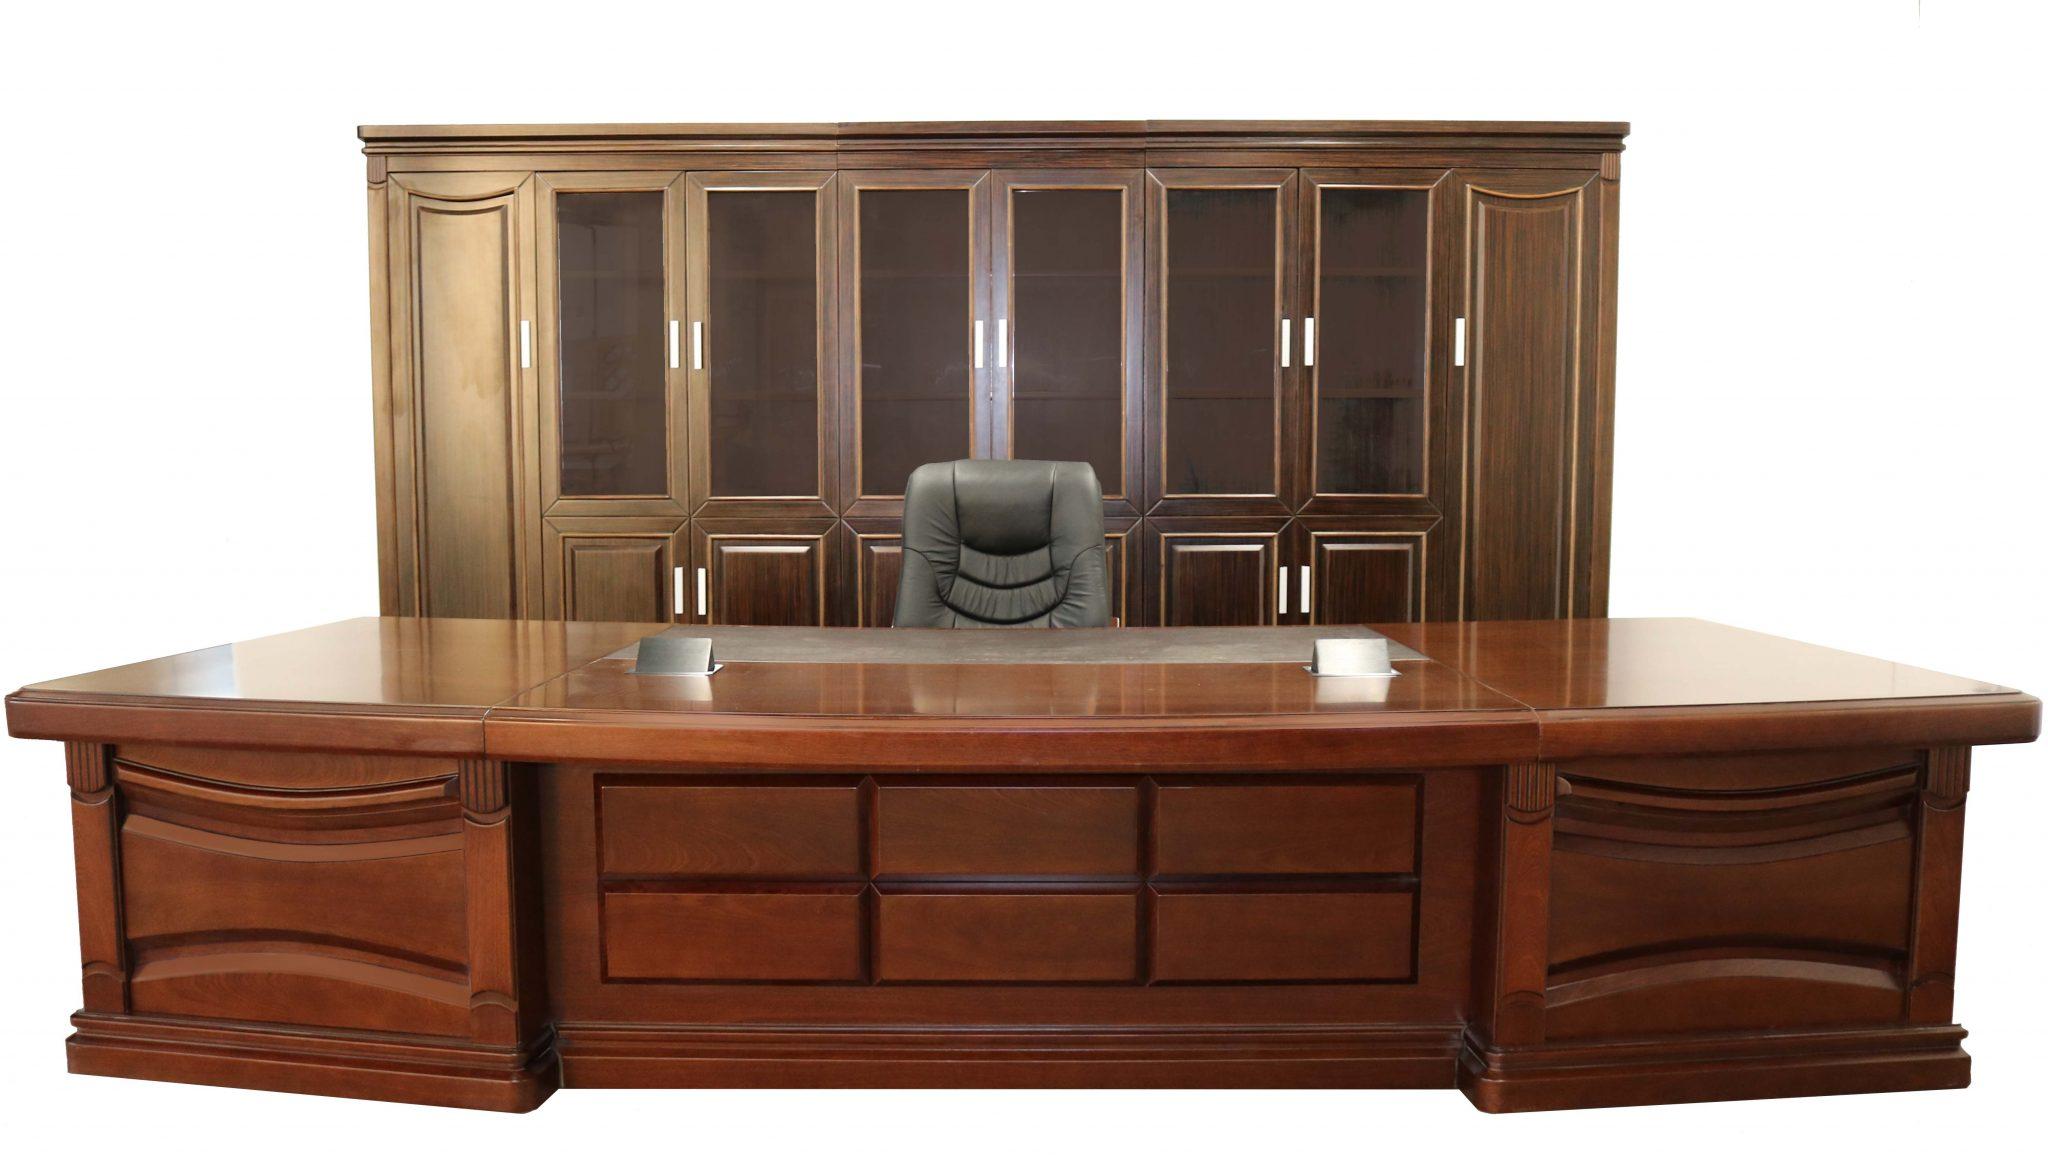 HighGate Executive Office Furniture Suite  Curved Desk